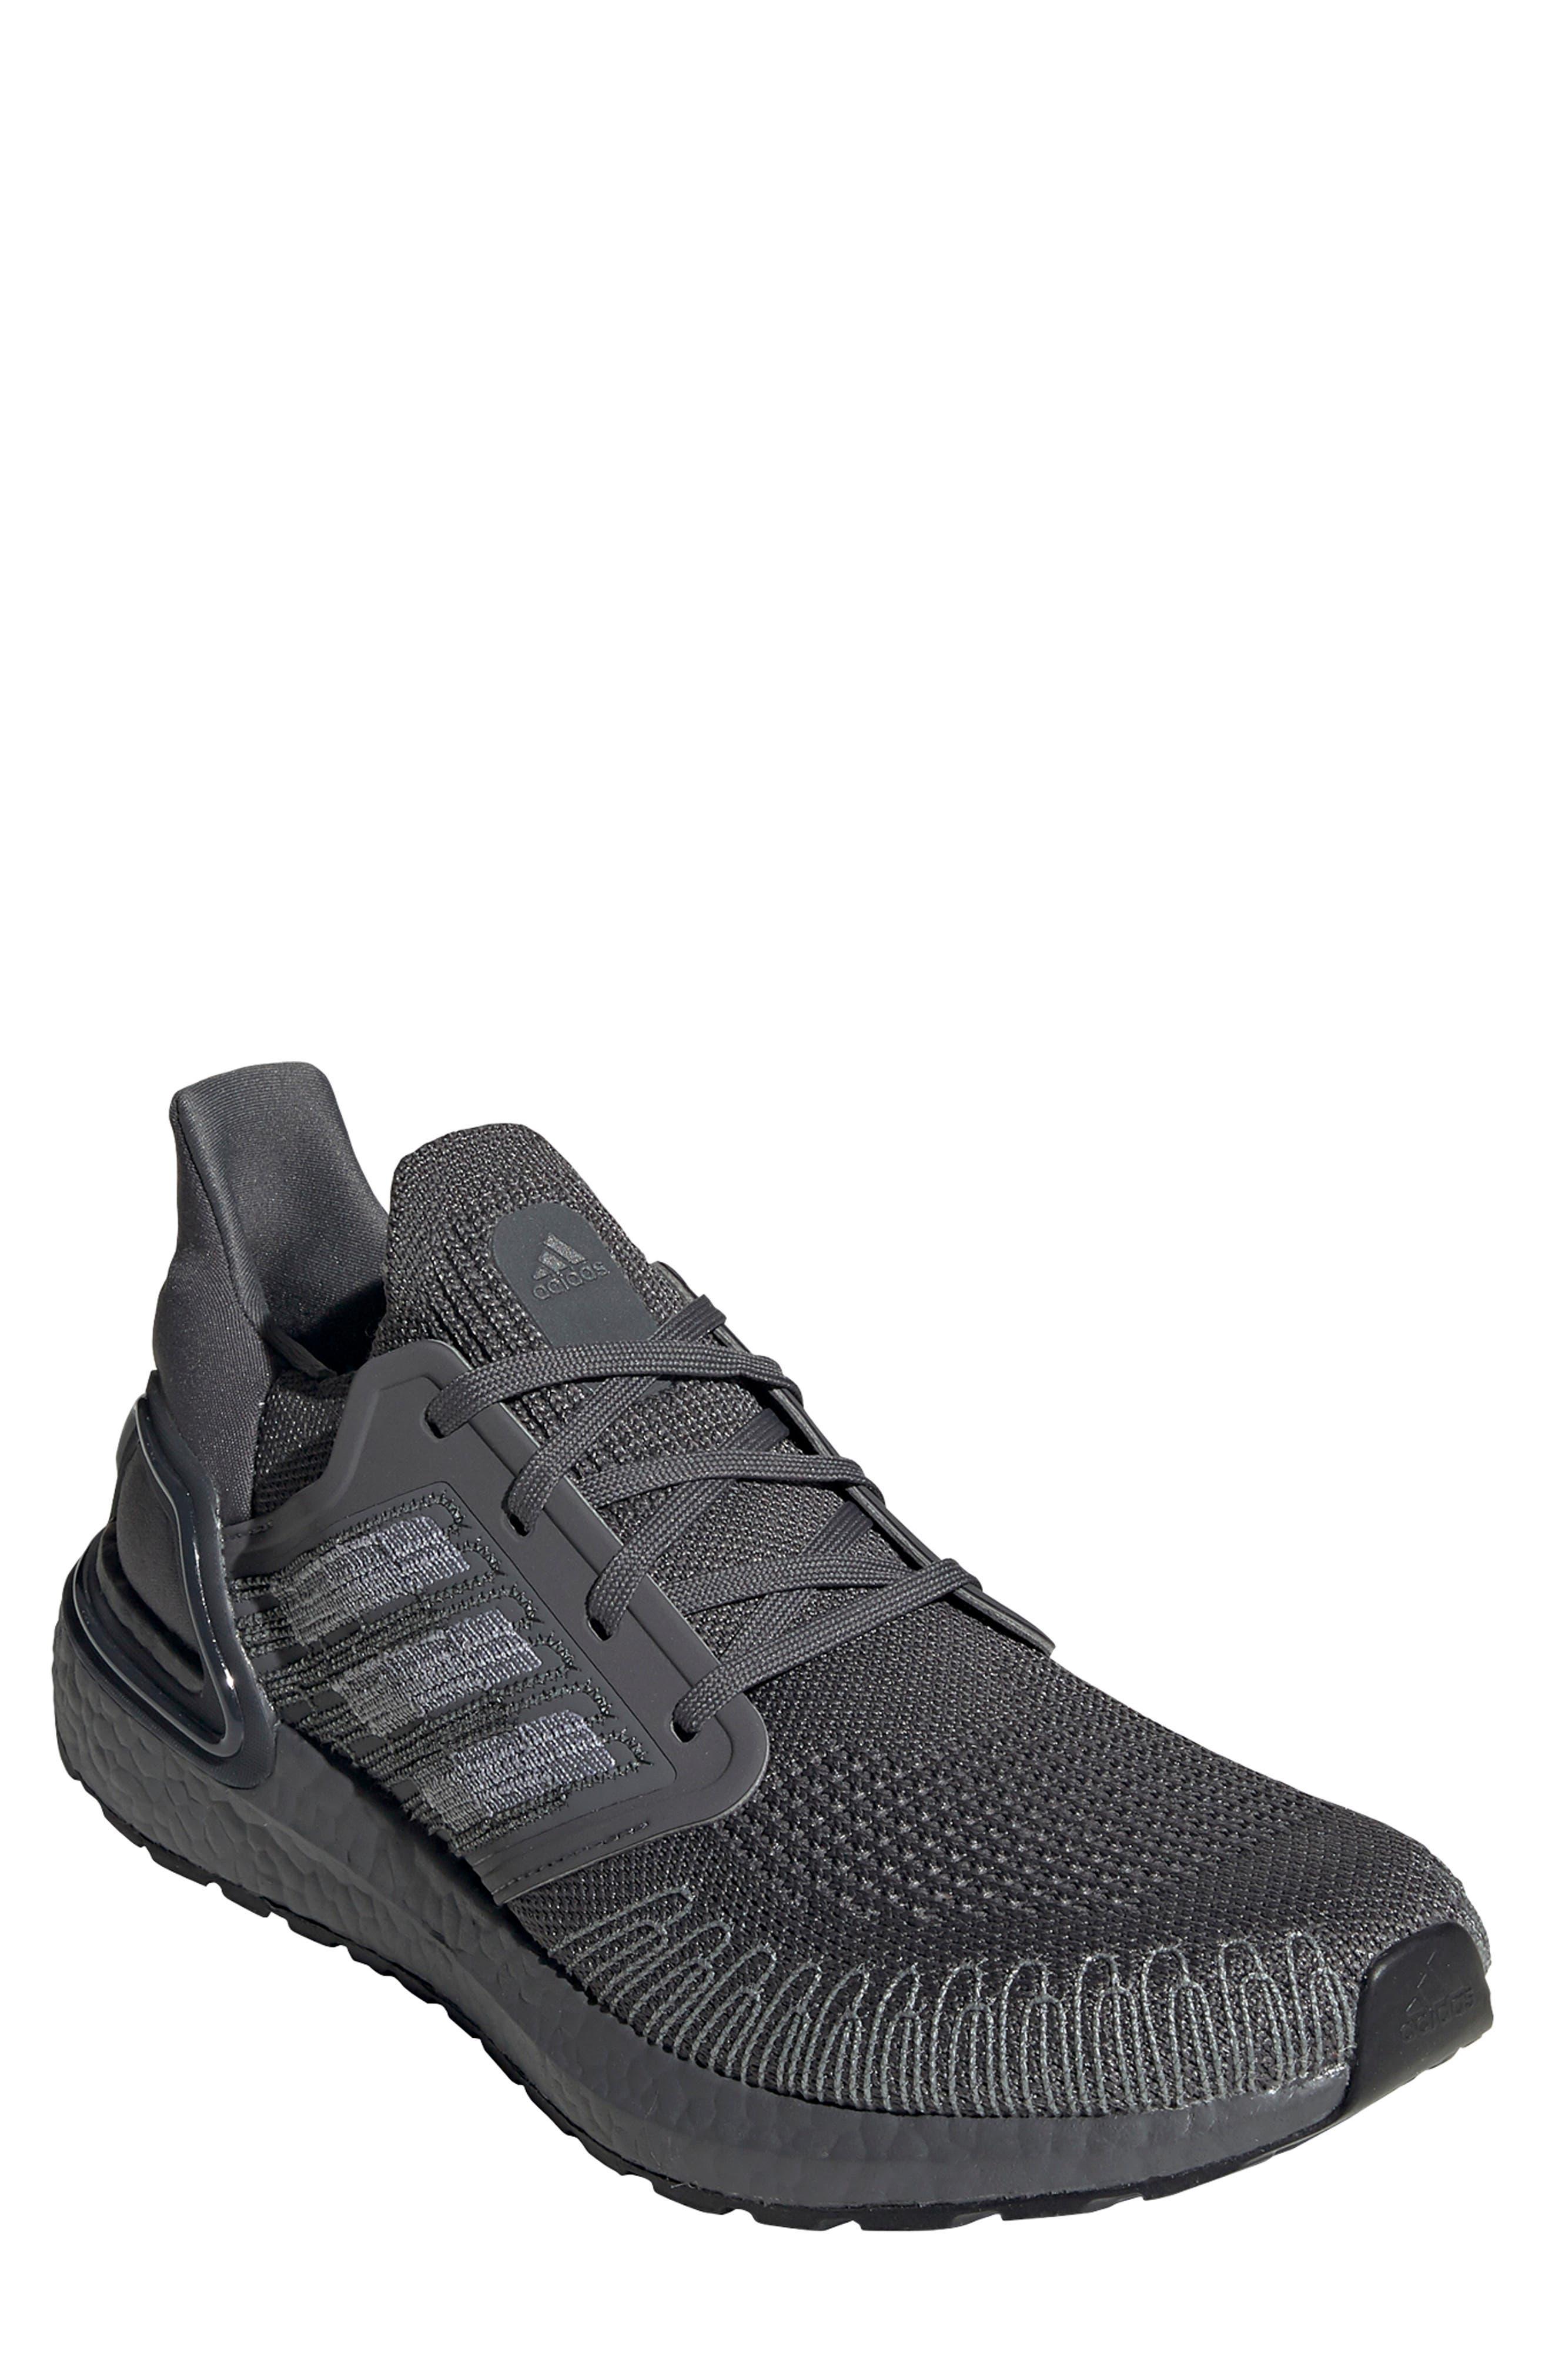 Men's Running Sneakers, Athletic & Running Shoes | Nordstrom